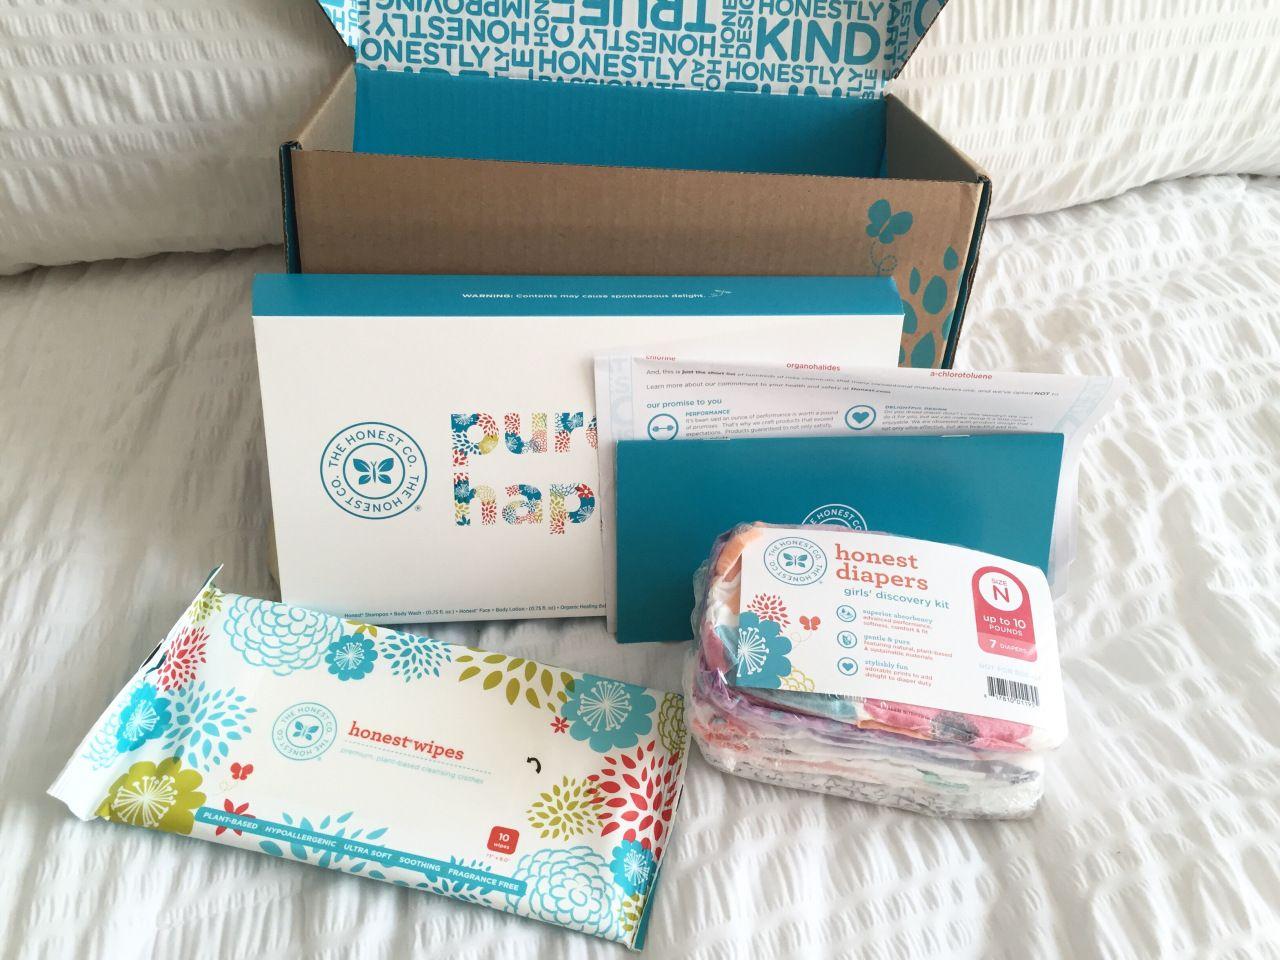 The Honest Company Free Trial Honest diapers, Honest